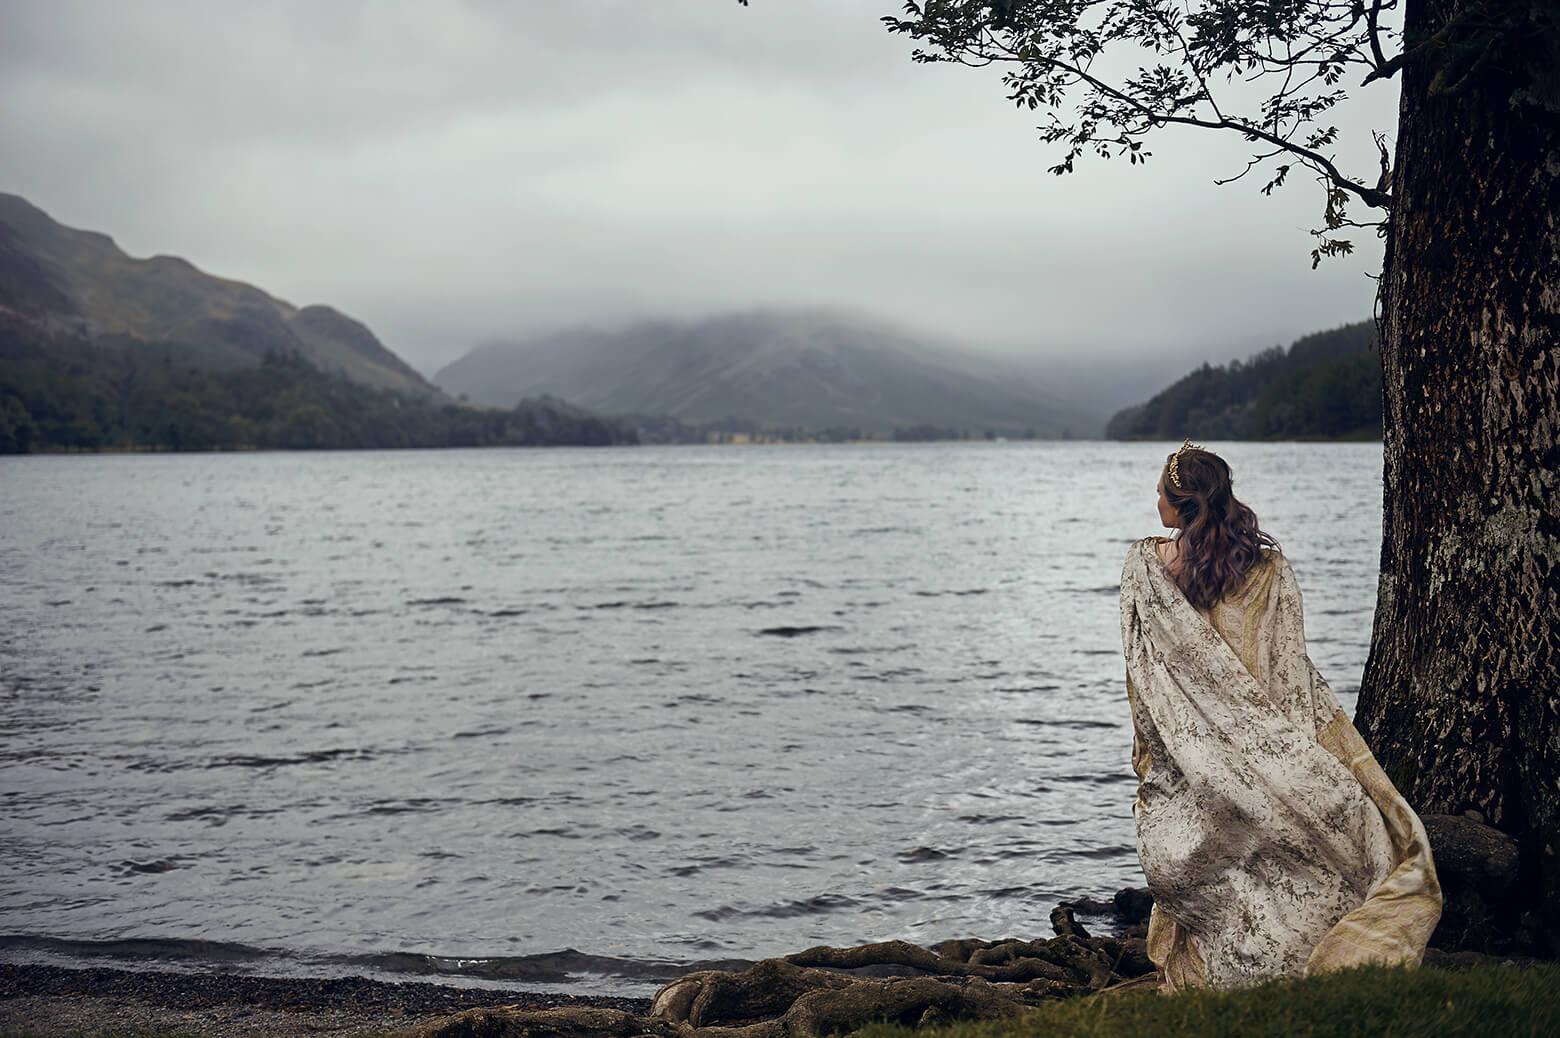 ursula schmitz, fotografie, wien, england, uk, destination, fairytale, lake, buttermere, dream photo shoot, photographie